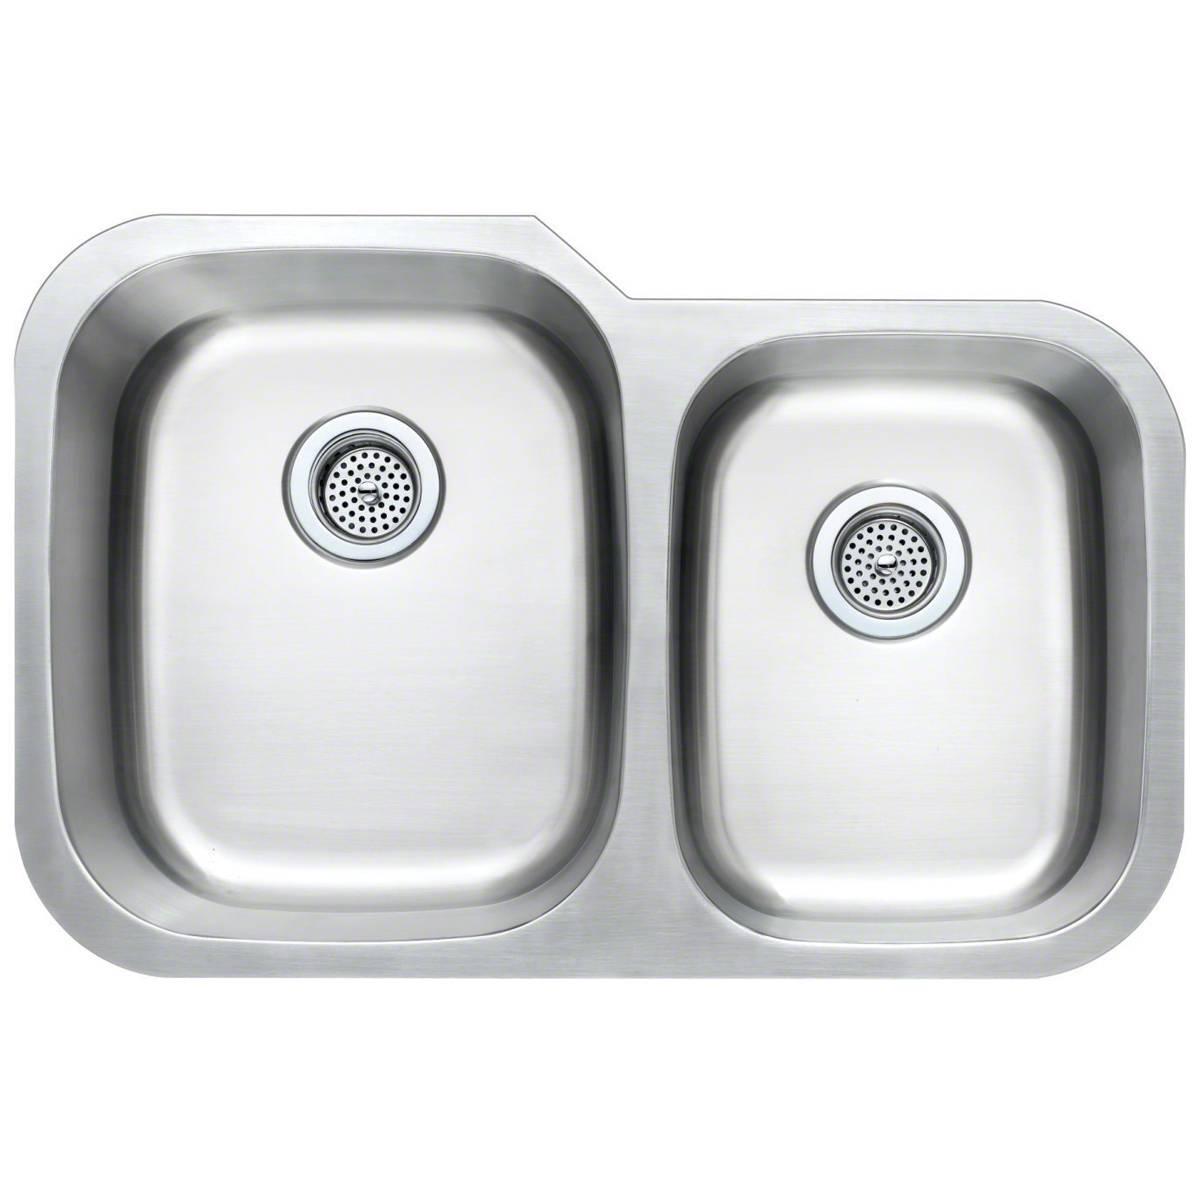 Sinks -ss-18-gau-double-bowl-60-40-3120s-SIN-18-DBLBWL-6040-3120S